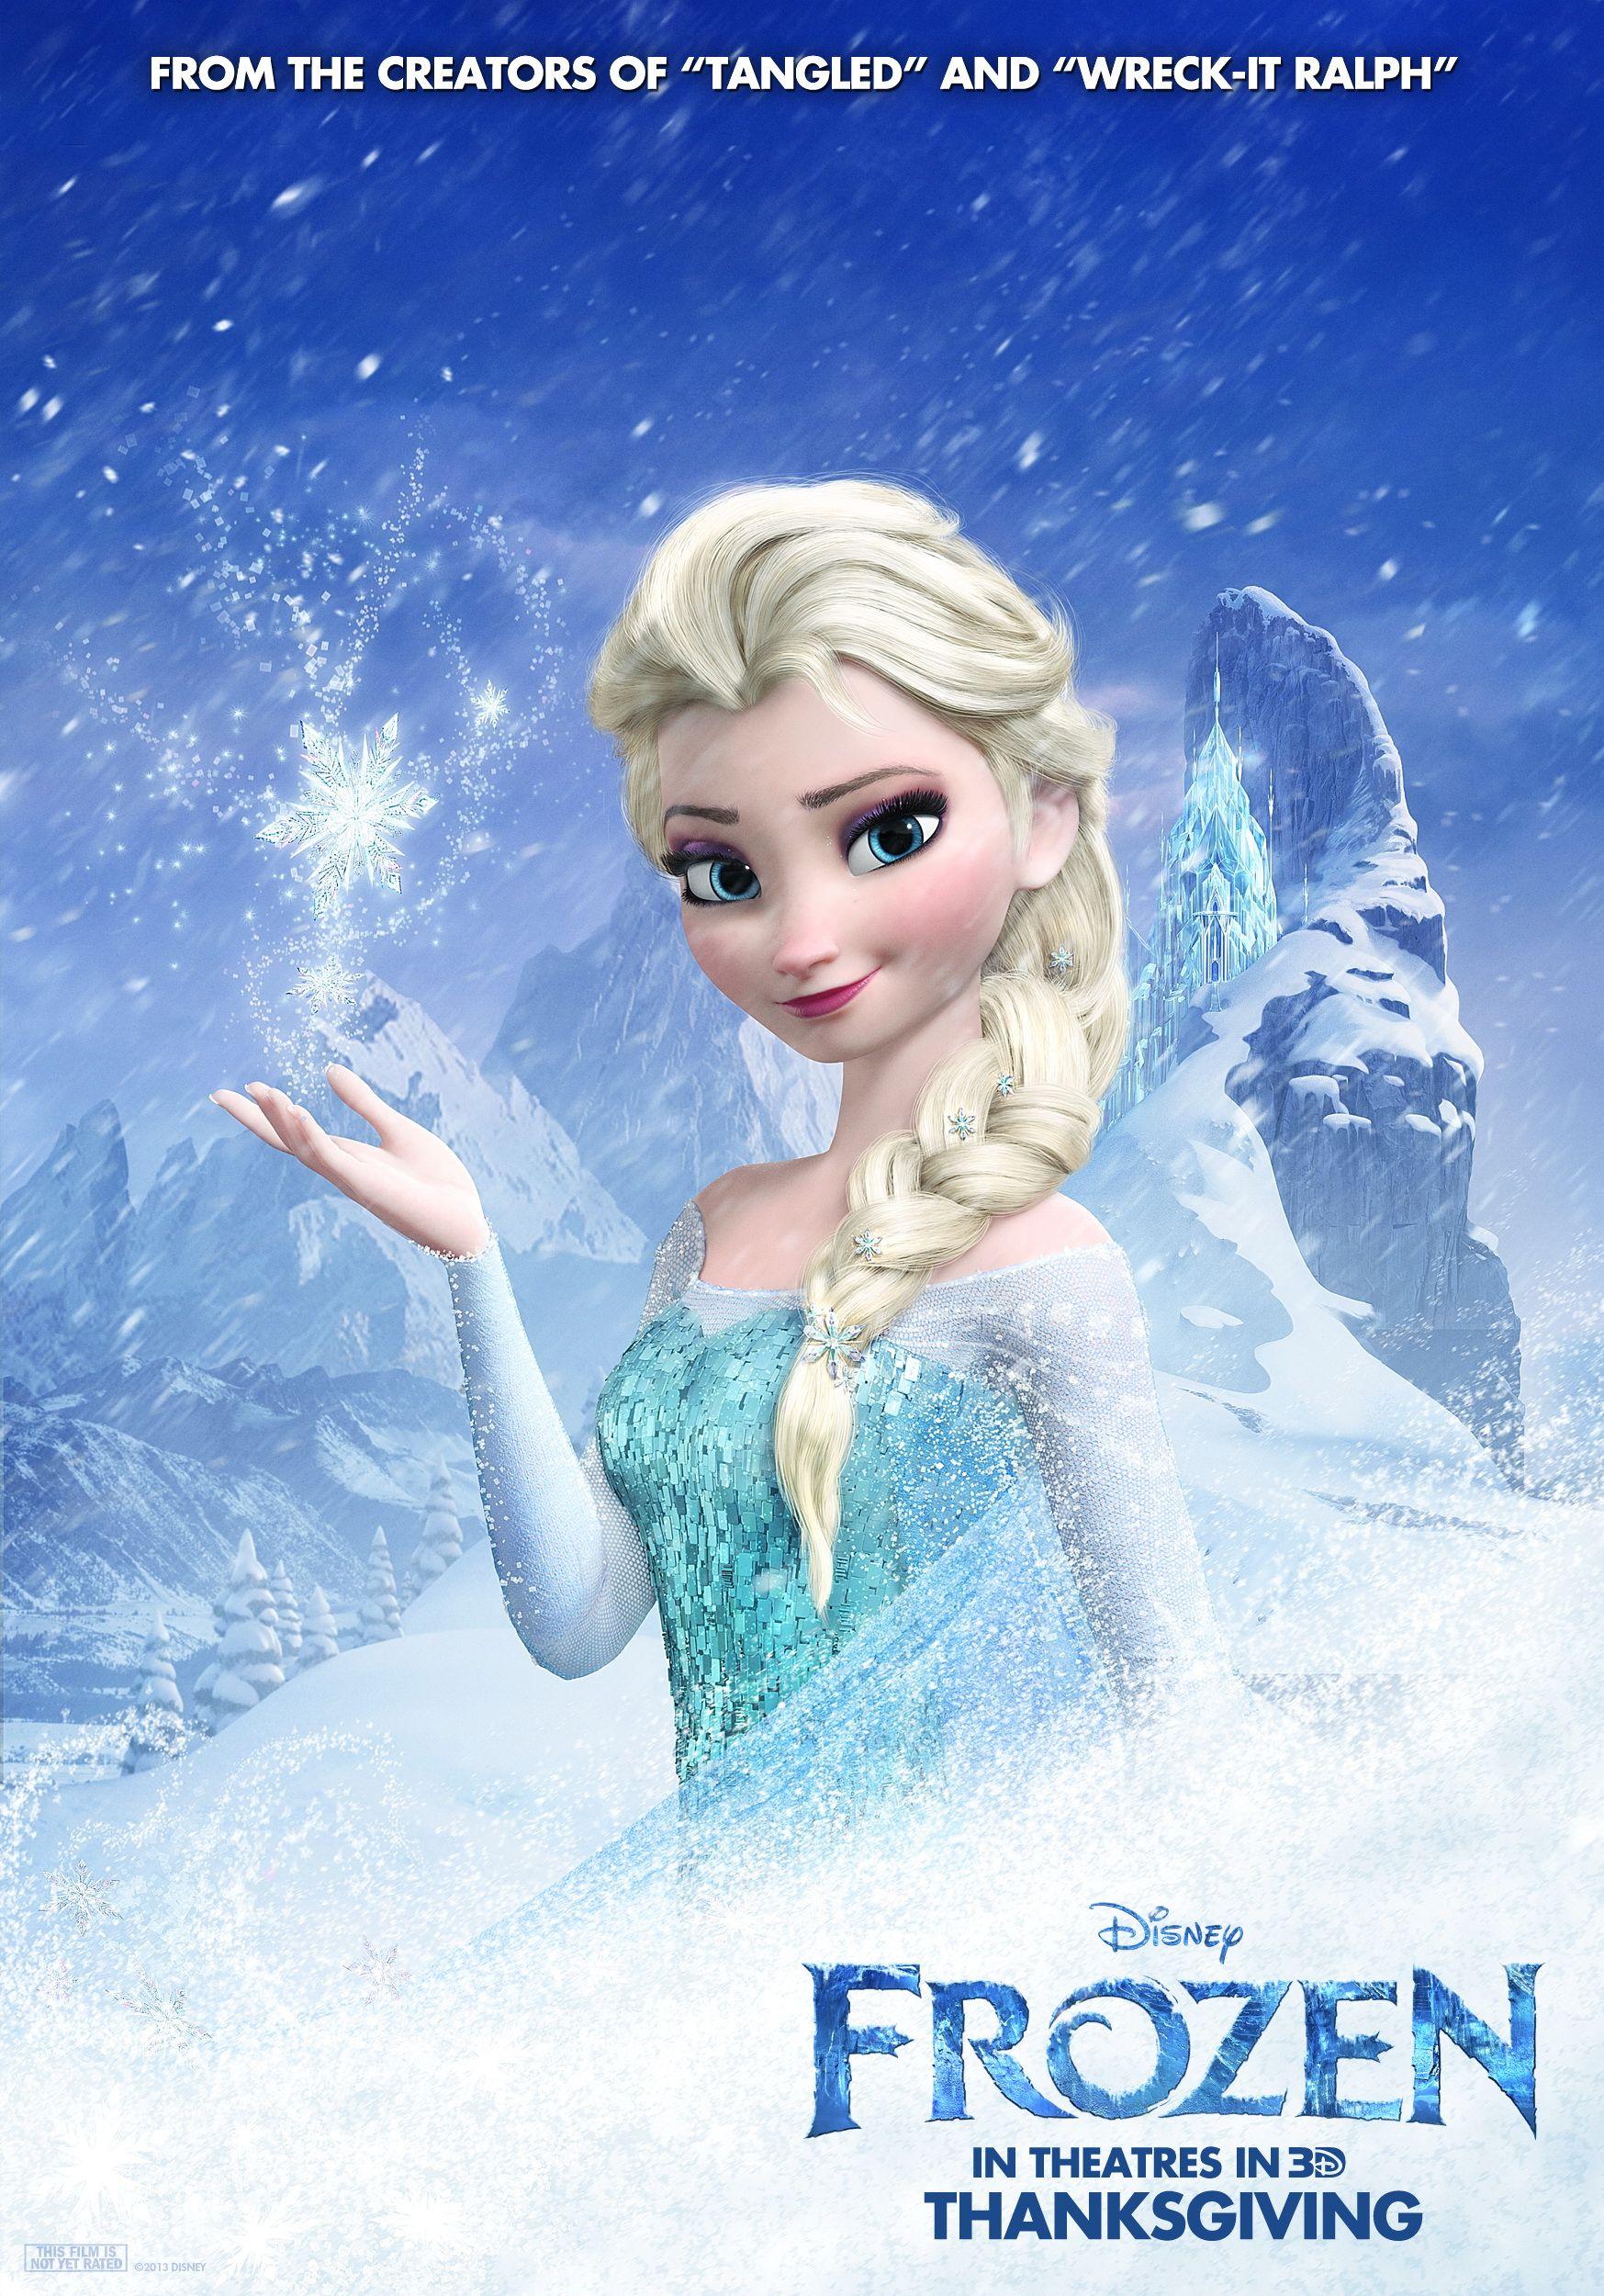 Elsa Gallery Frozen Poster Frozen Hintergrundbild Disney